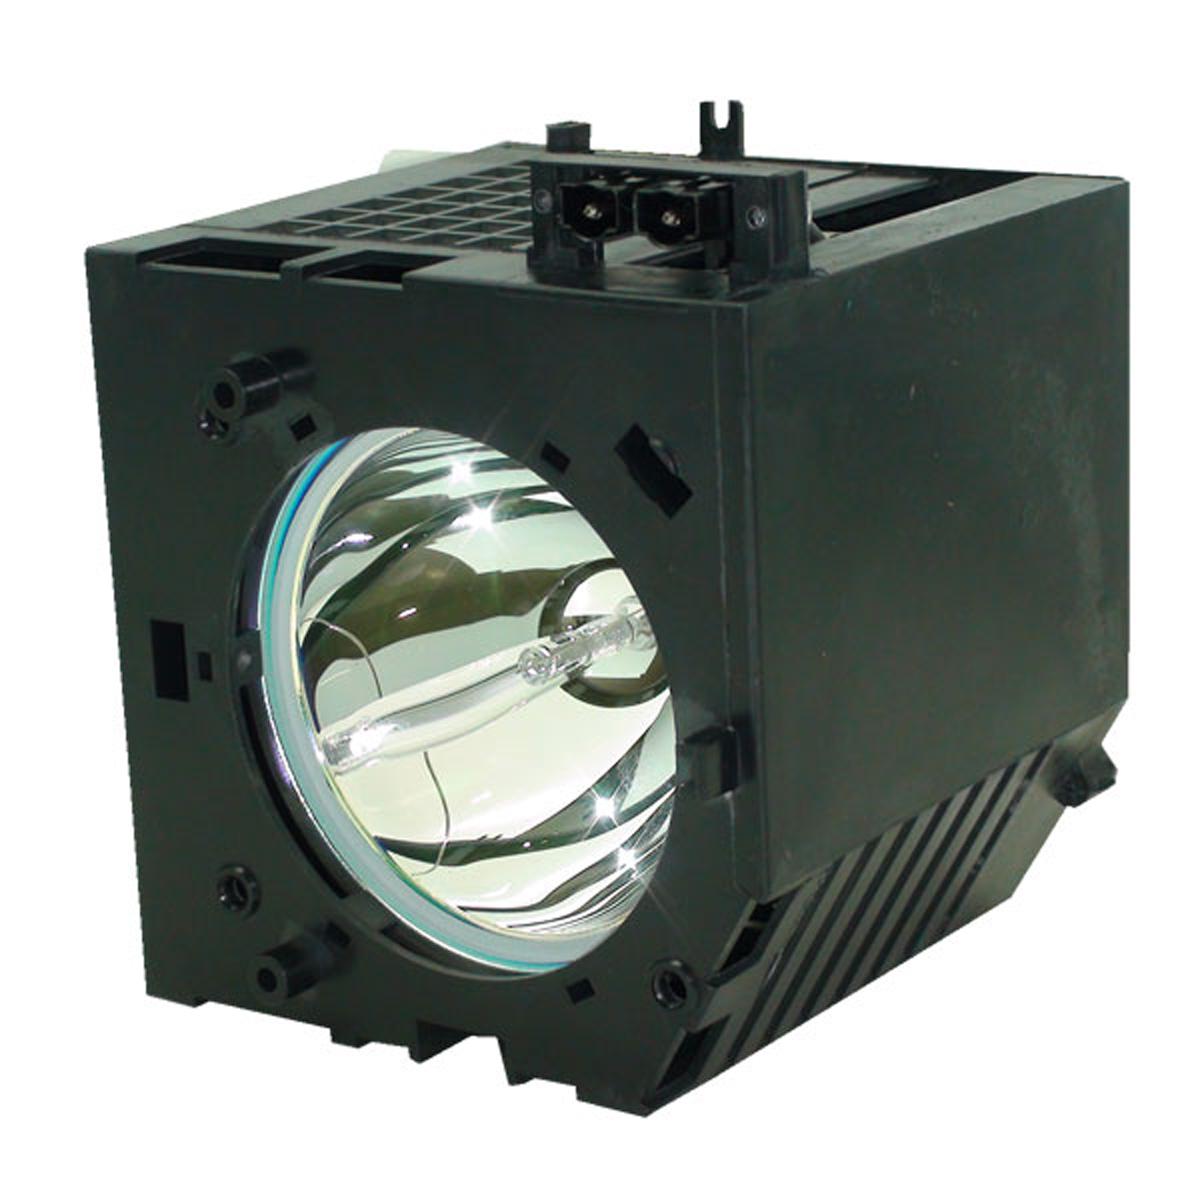 Lutema Economy for Zenith RE44SZ61D TV Lamp with Housing - image 5 de 5